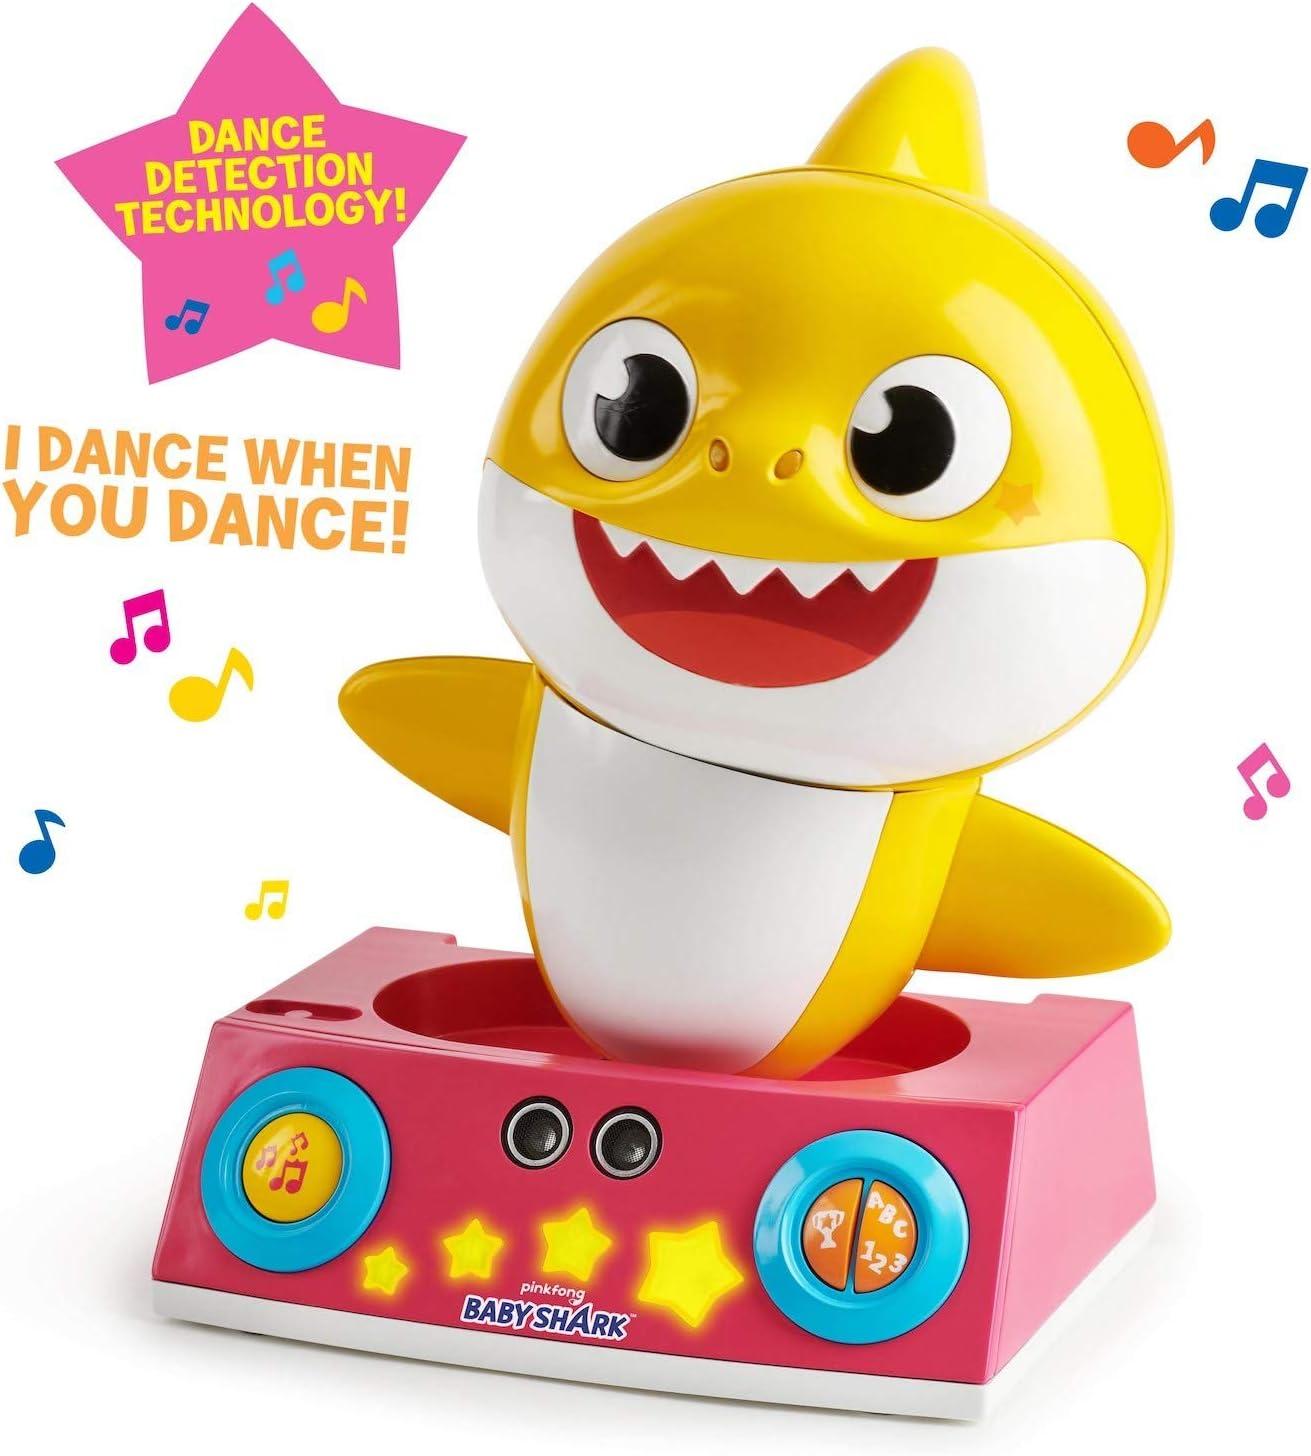 Baby Shark Dancing DJ - Dance detection technology